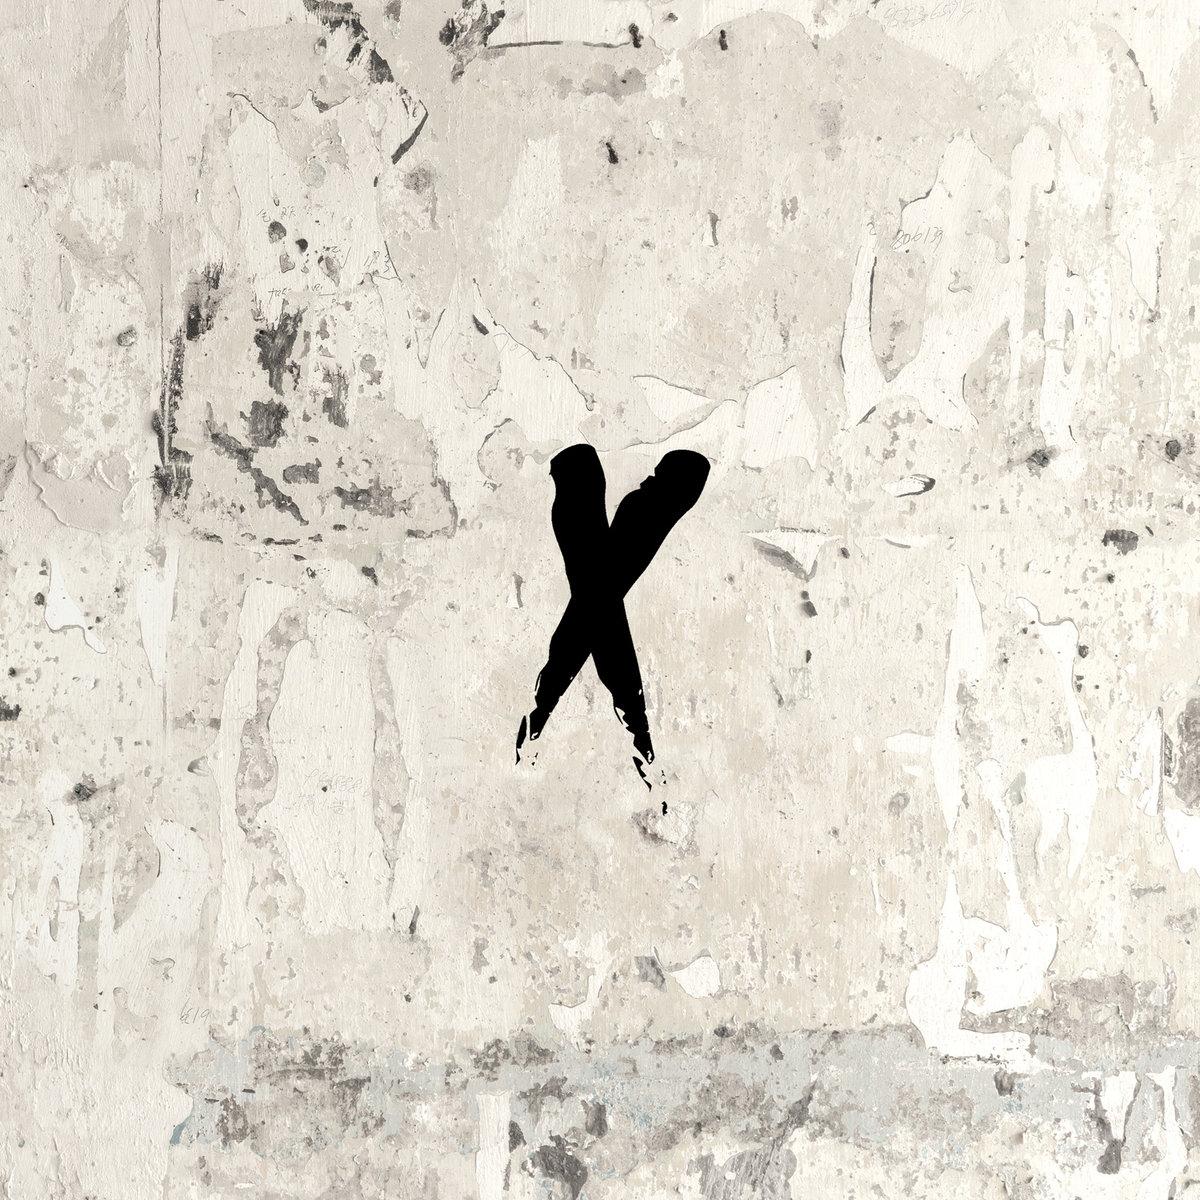 NxWorries – Yes Lawd!